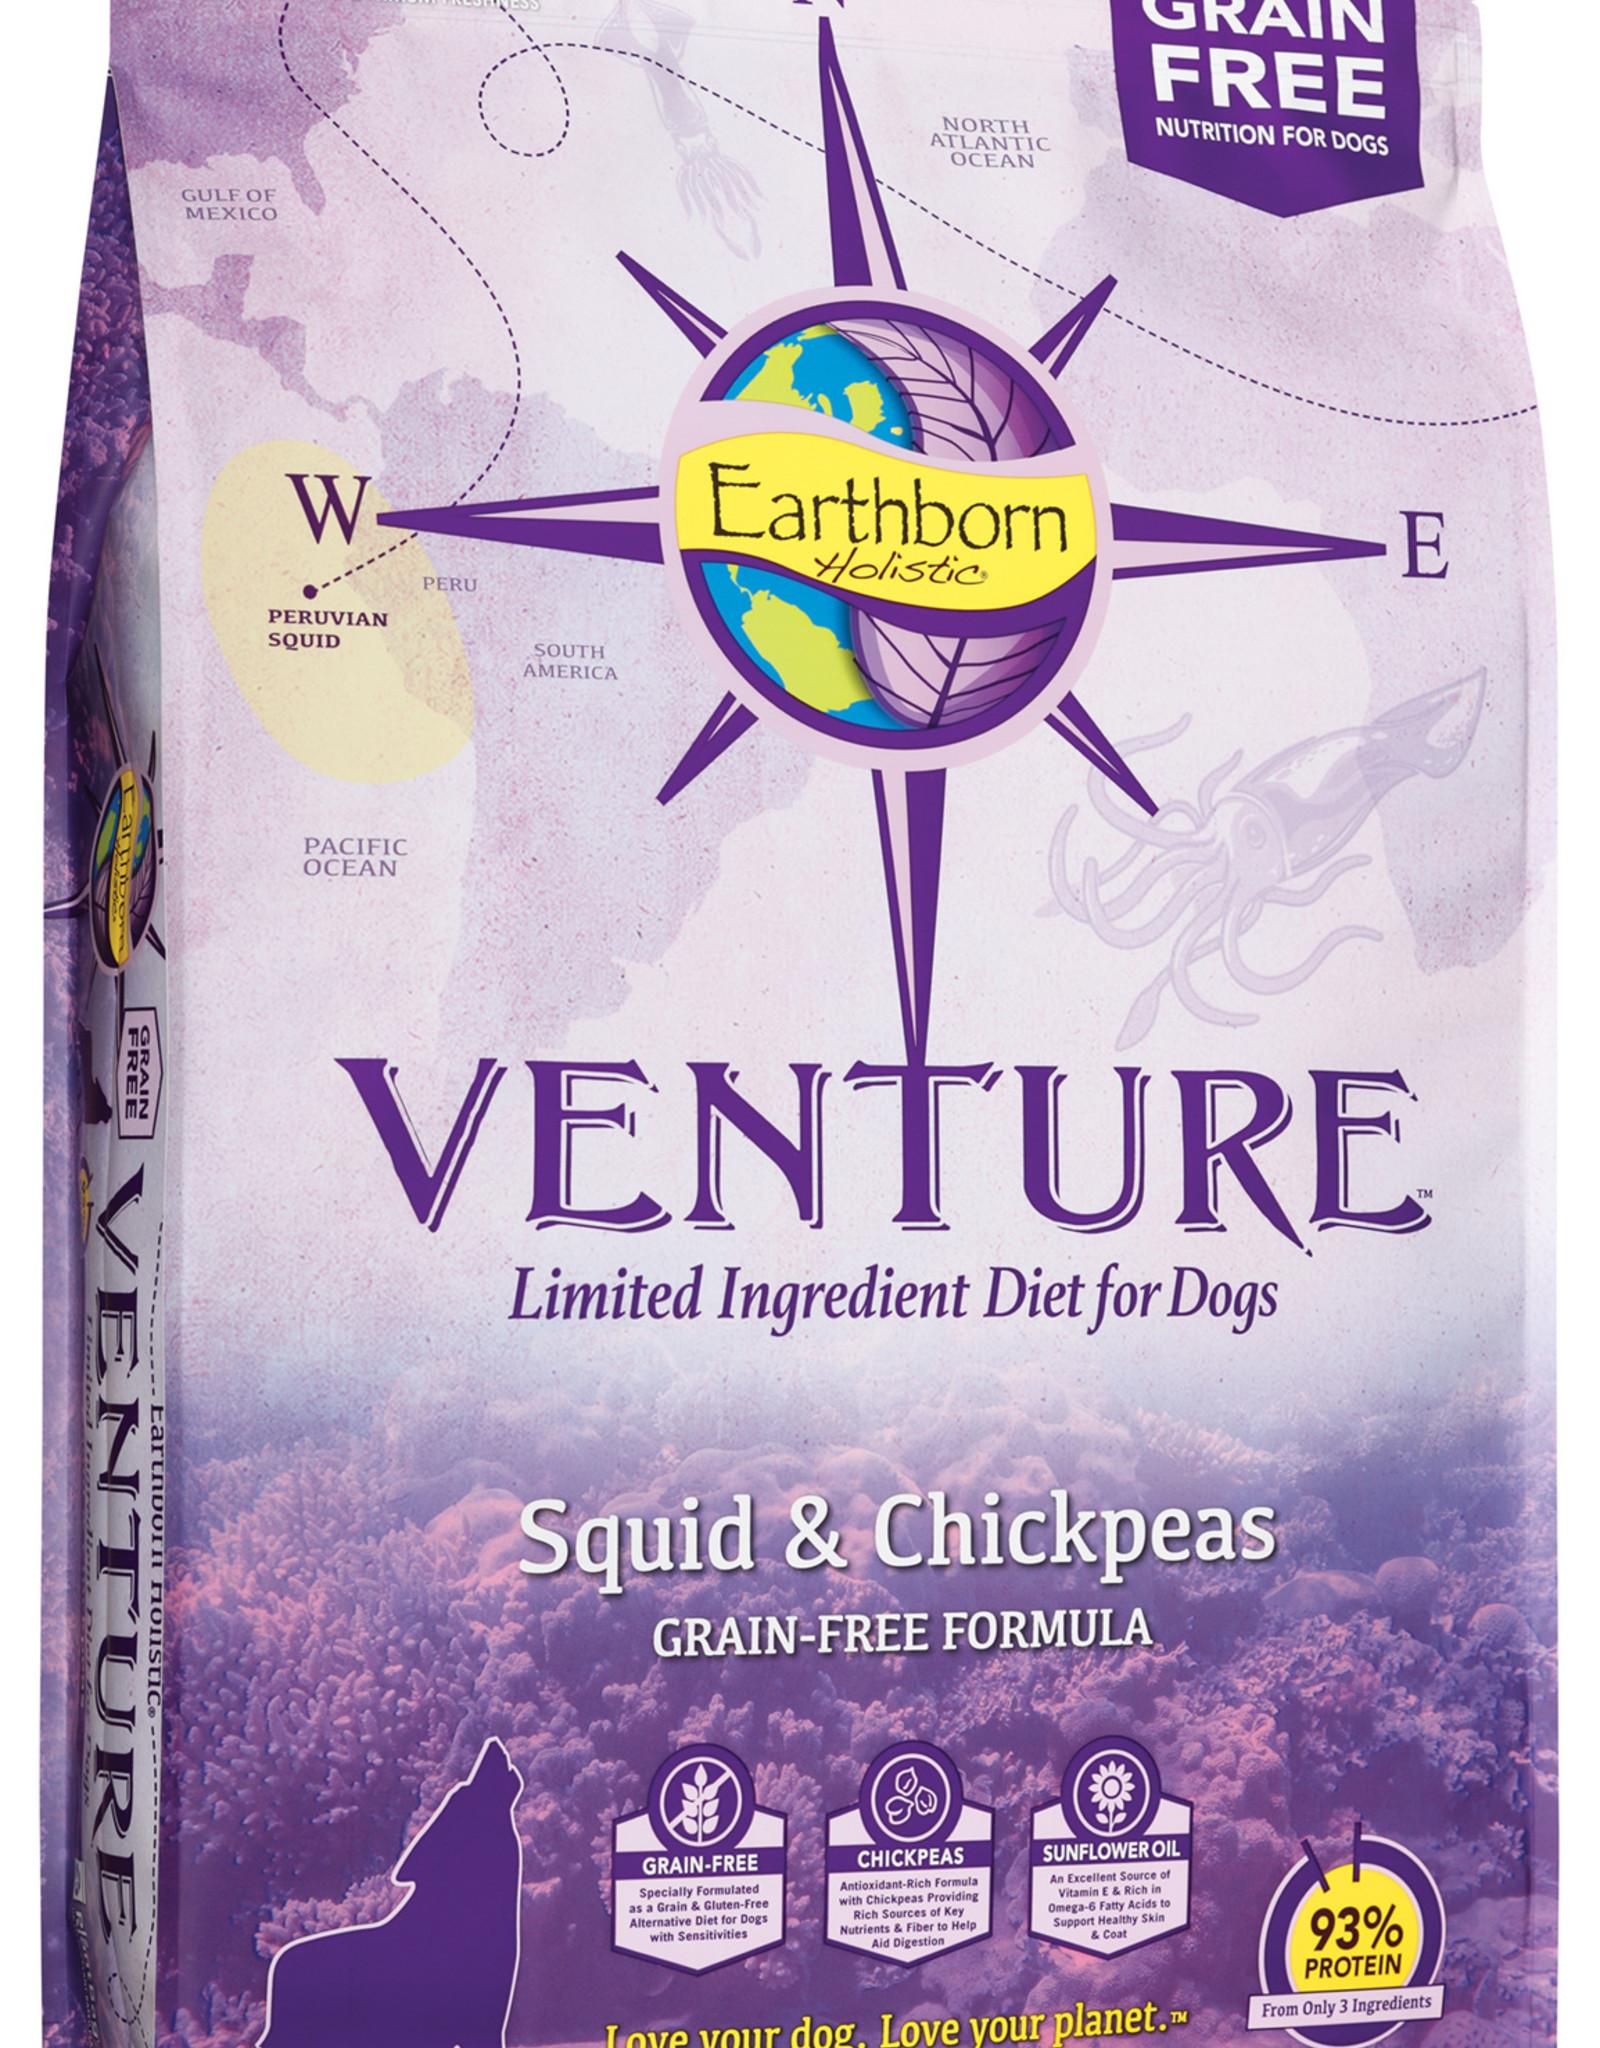 Earthborn Earthborn Venture Dog Food Squid & Chickpeas